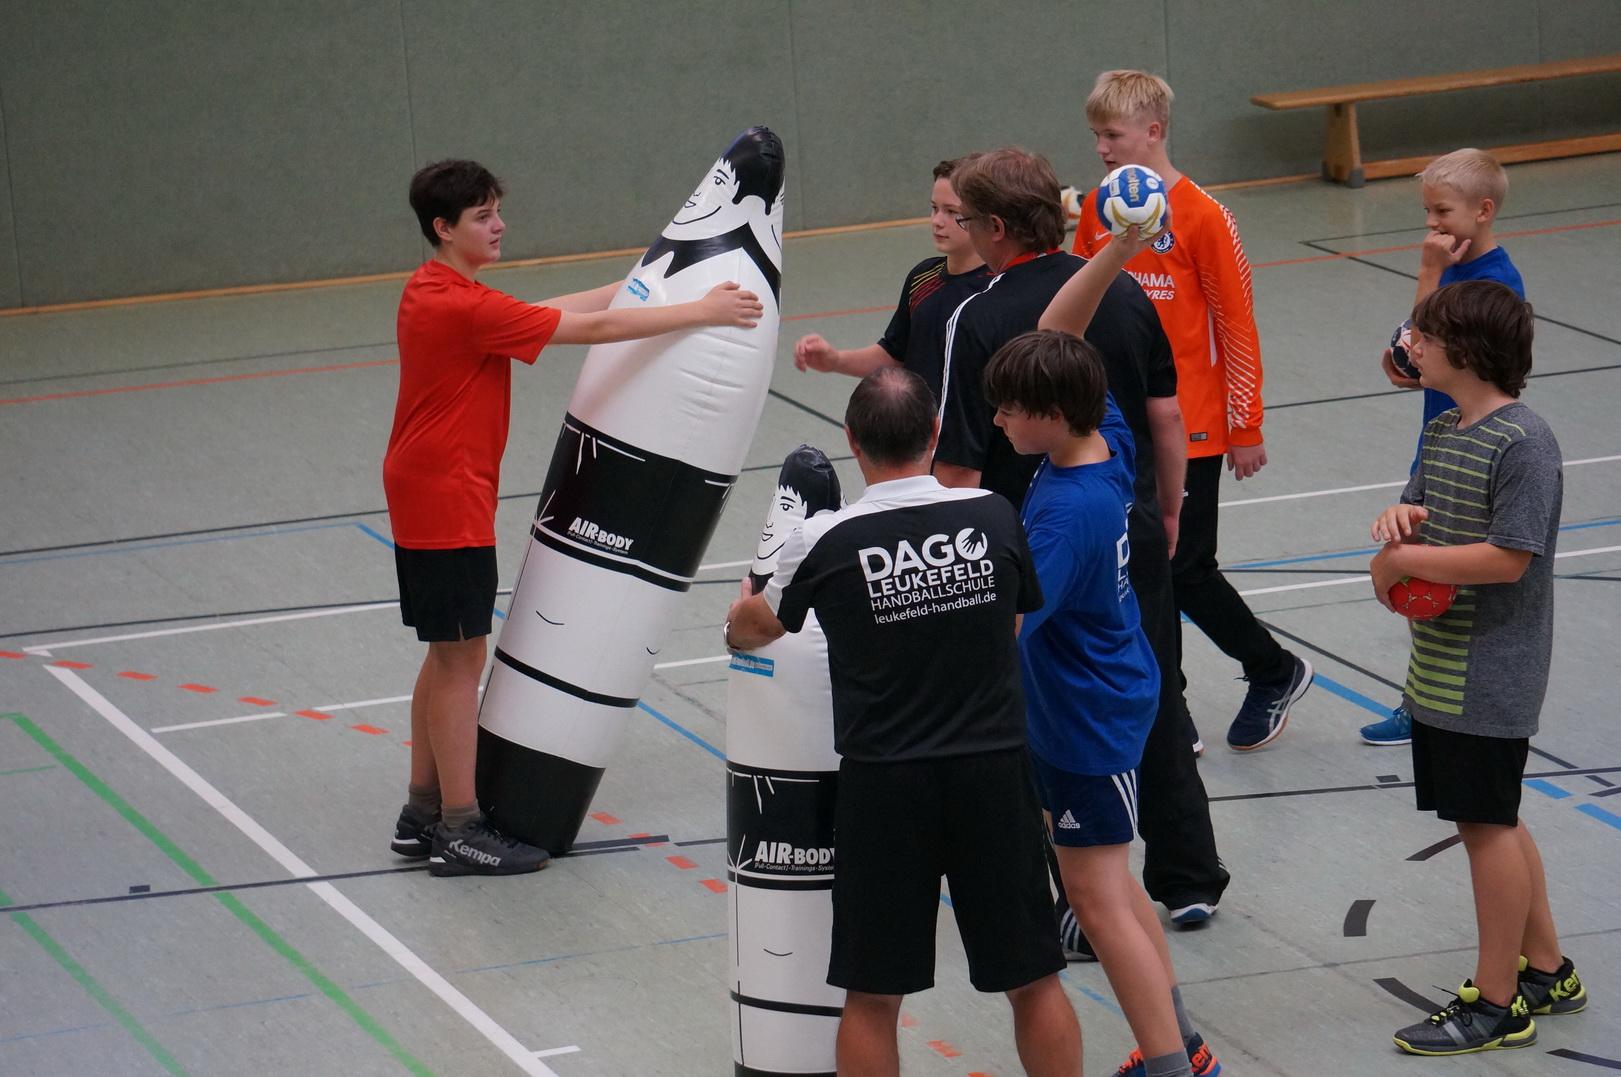 201808_Handballcamp_SDH_MG_235w